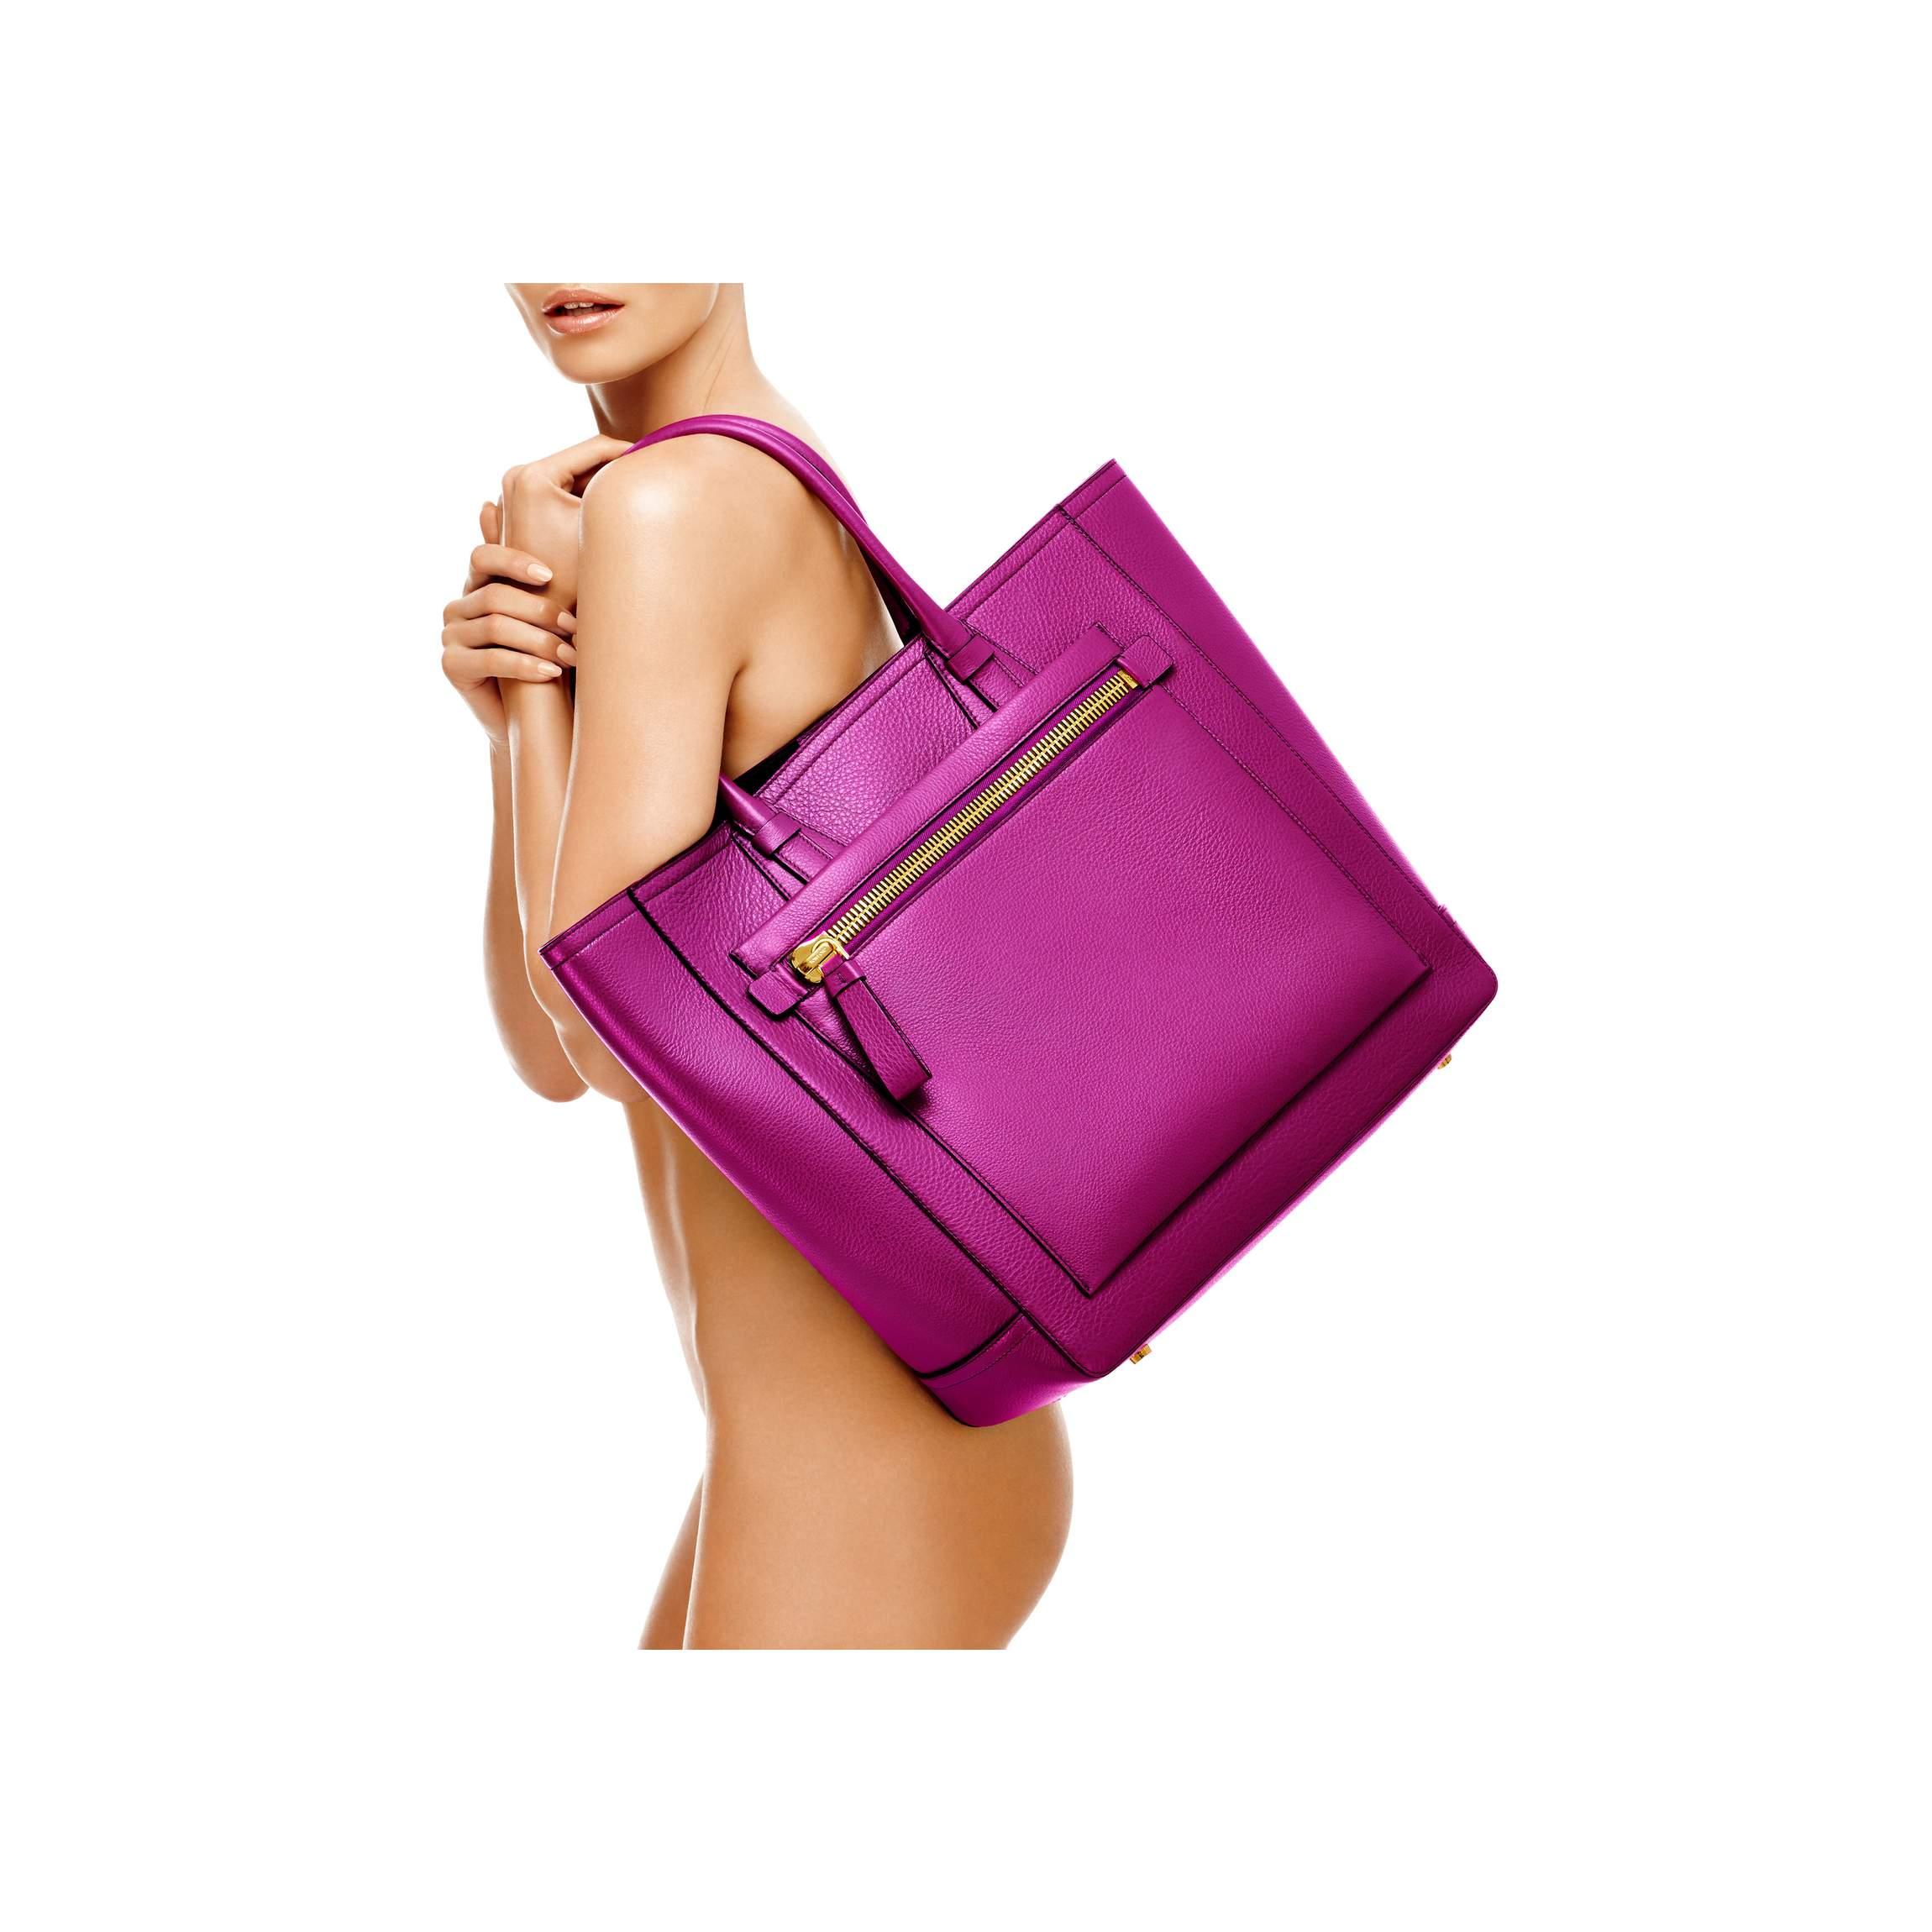 TOM FORD Summer Tote Handbags